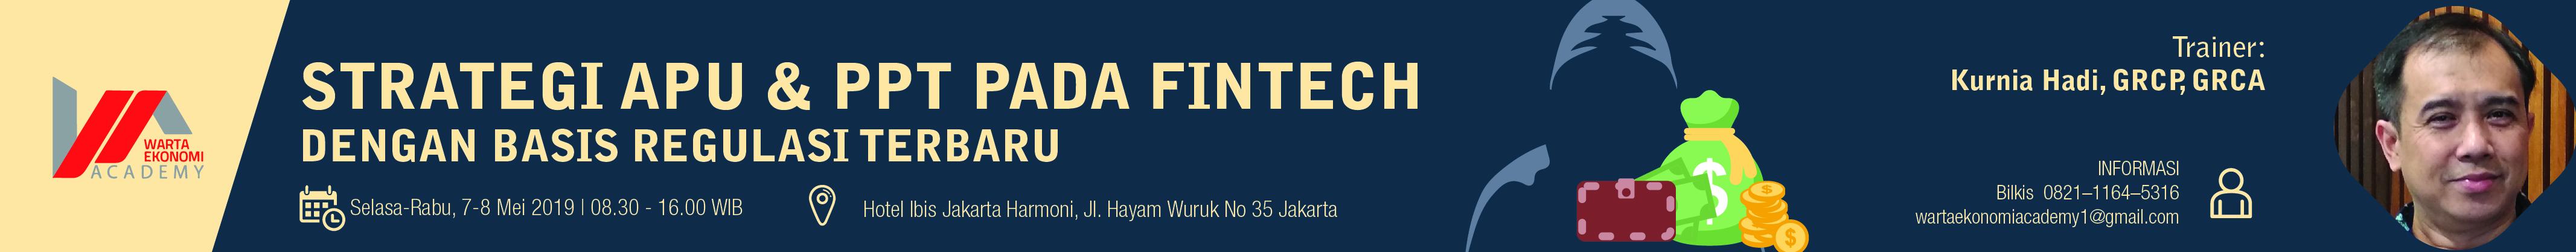 Strategi APU dan PPT pada Fintech